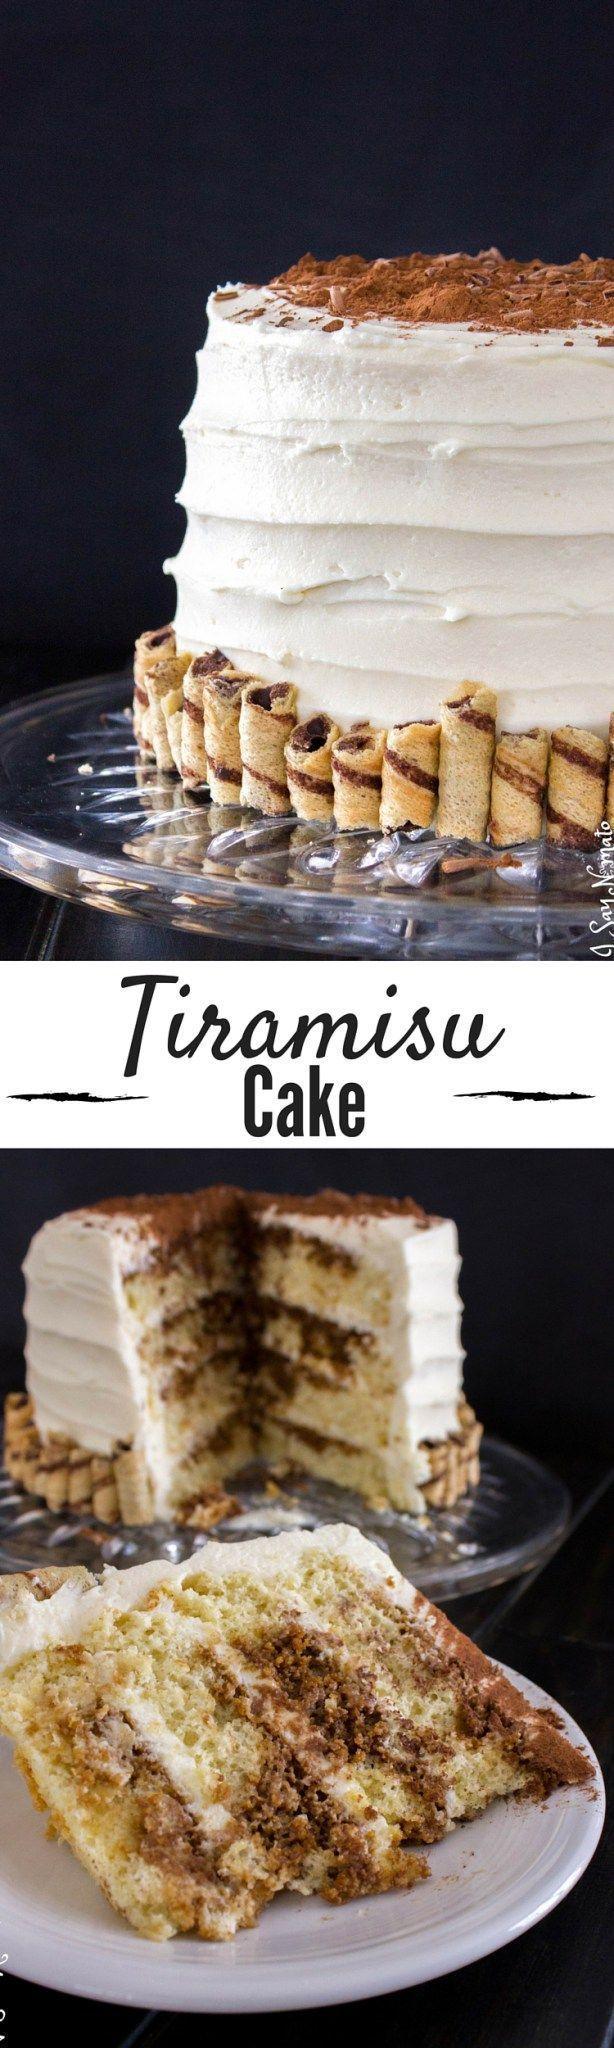 This Tiramisu Cake is THE BEST. Layers of light sponge cake, espresso and rum, and decadent mascarpone frosting!